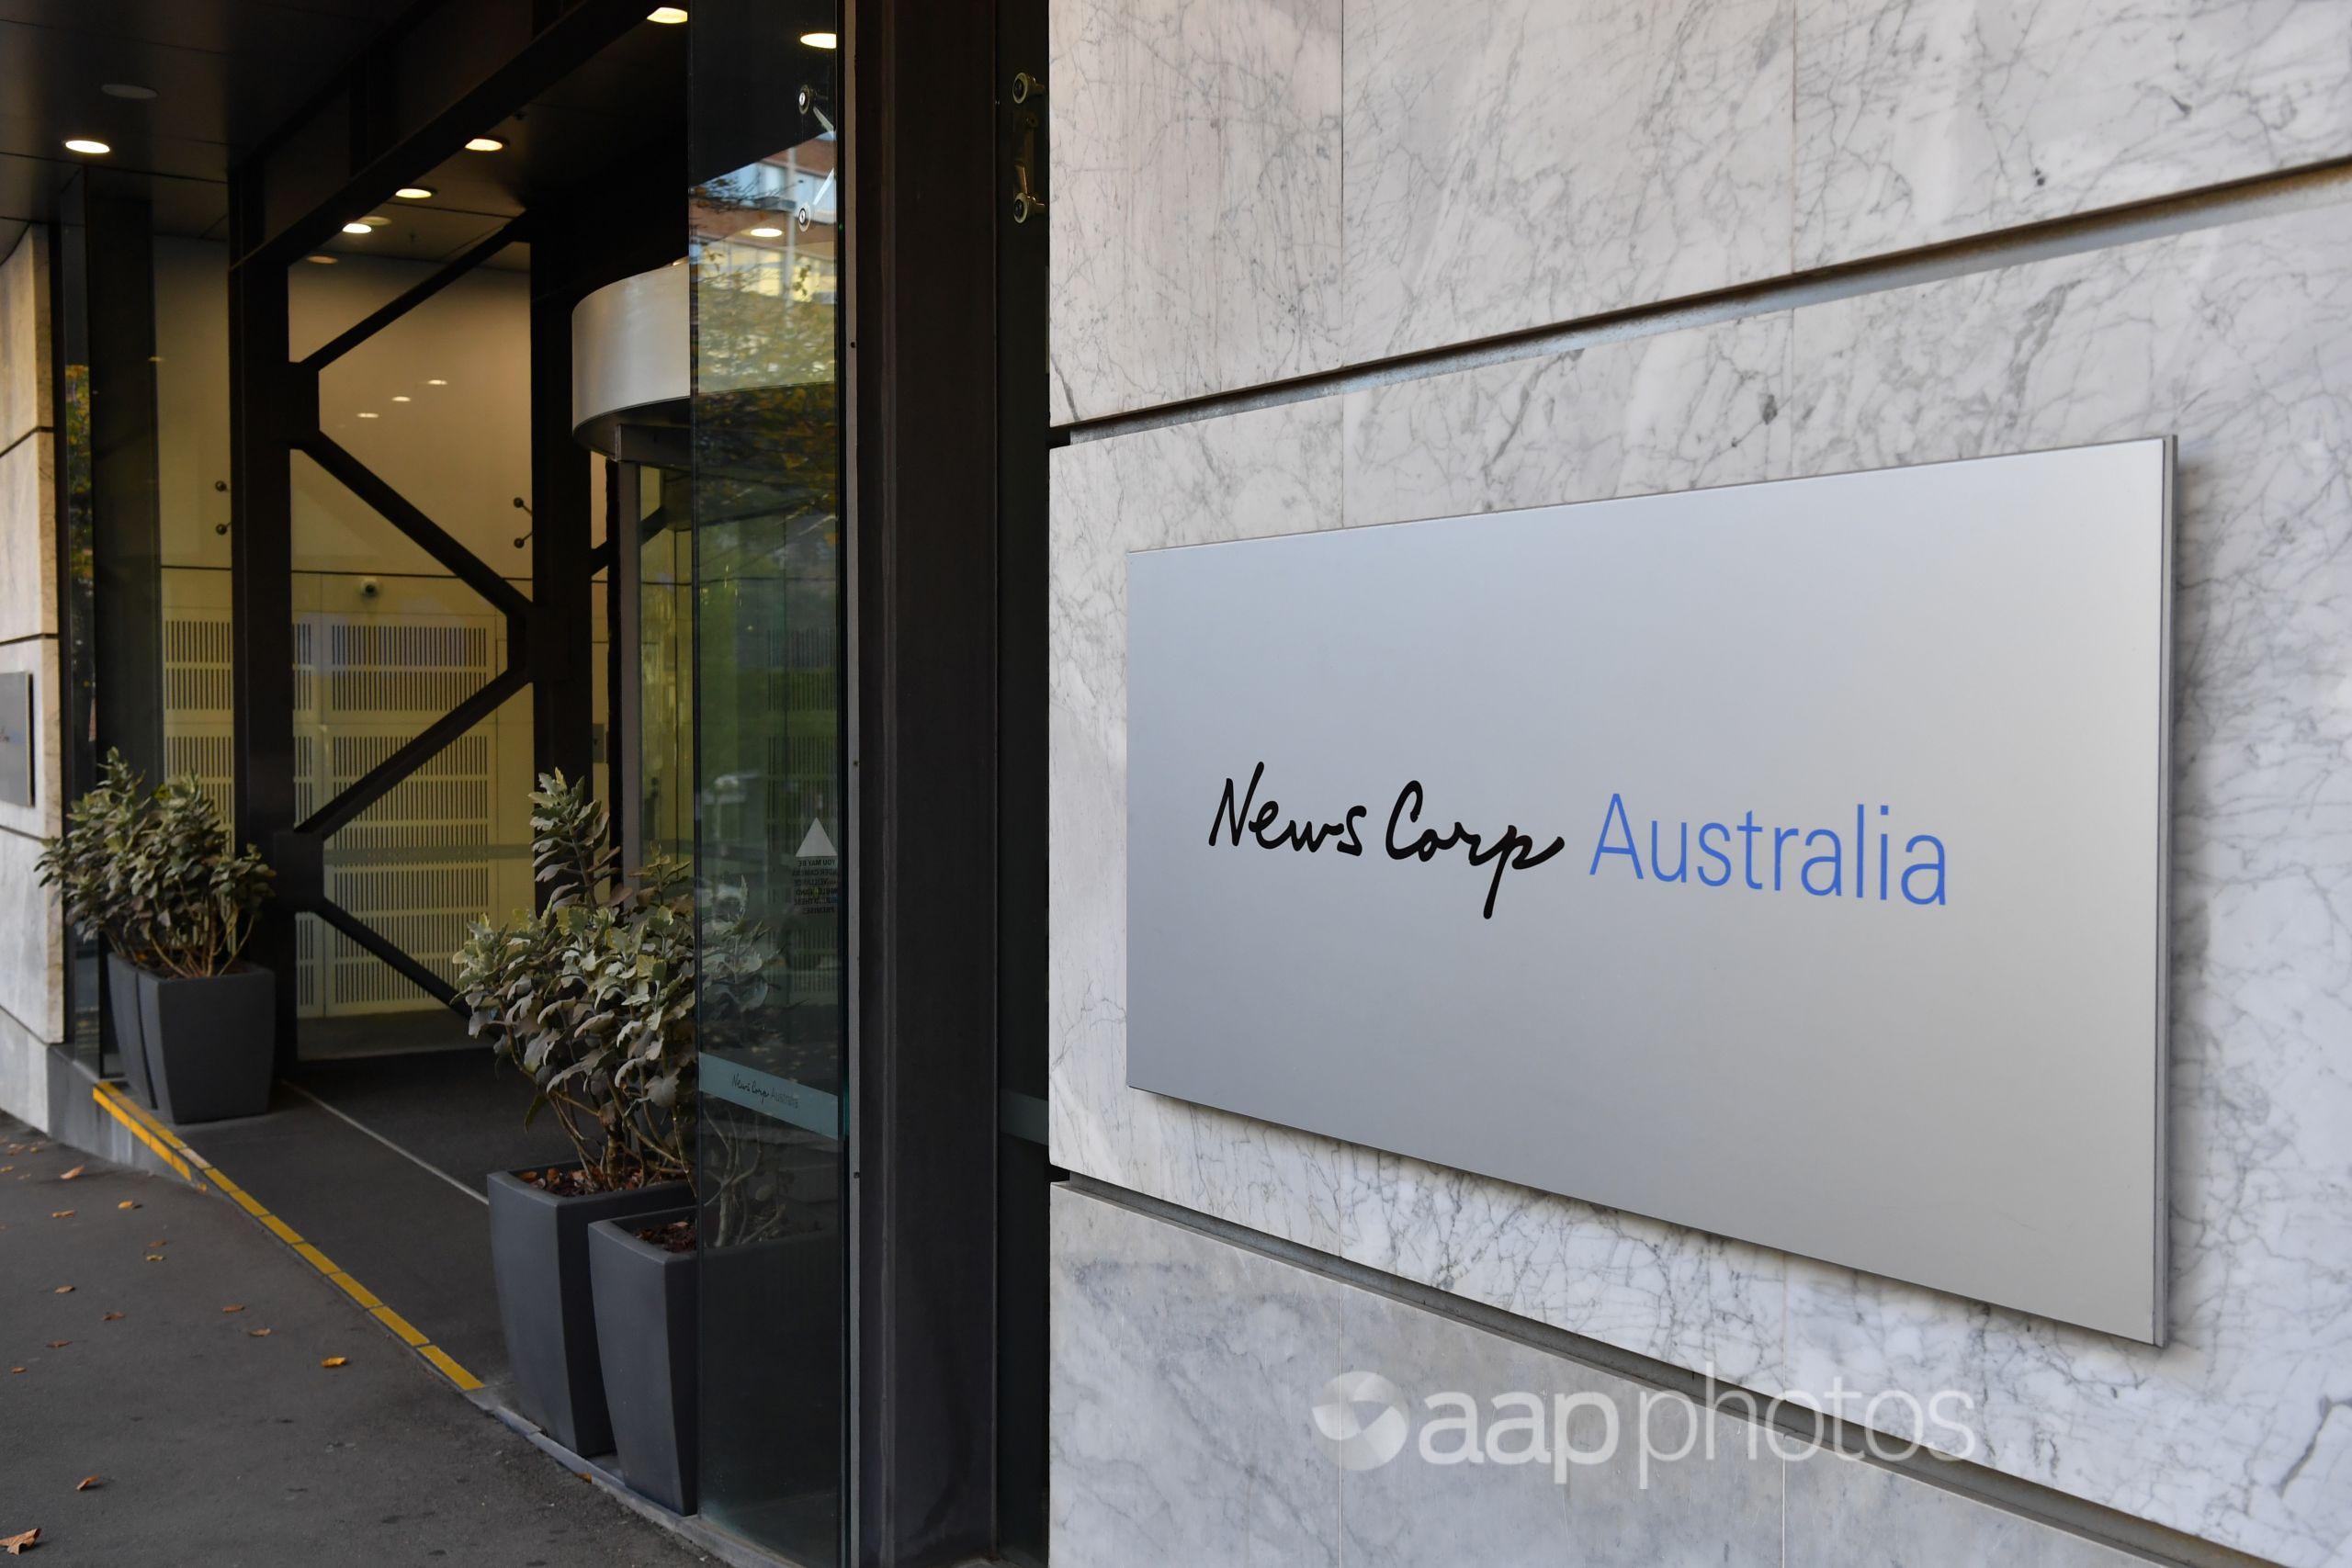 News Corp Australia's Holt Street headquarters in Sydney.